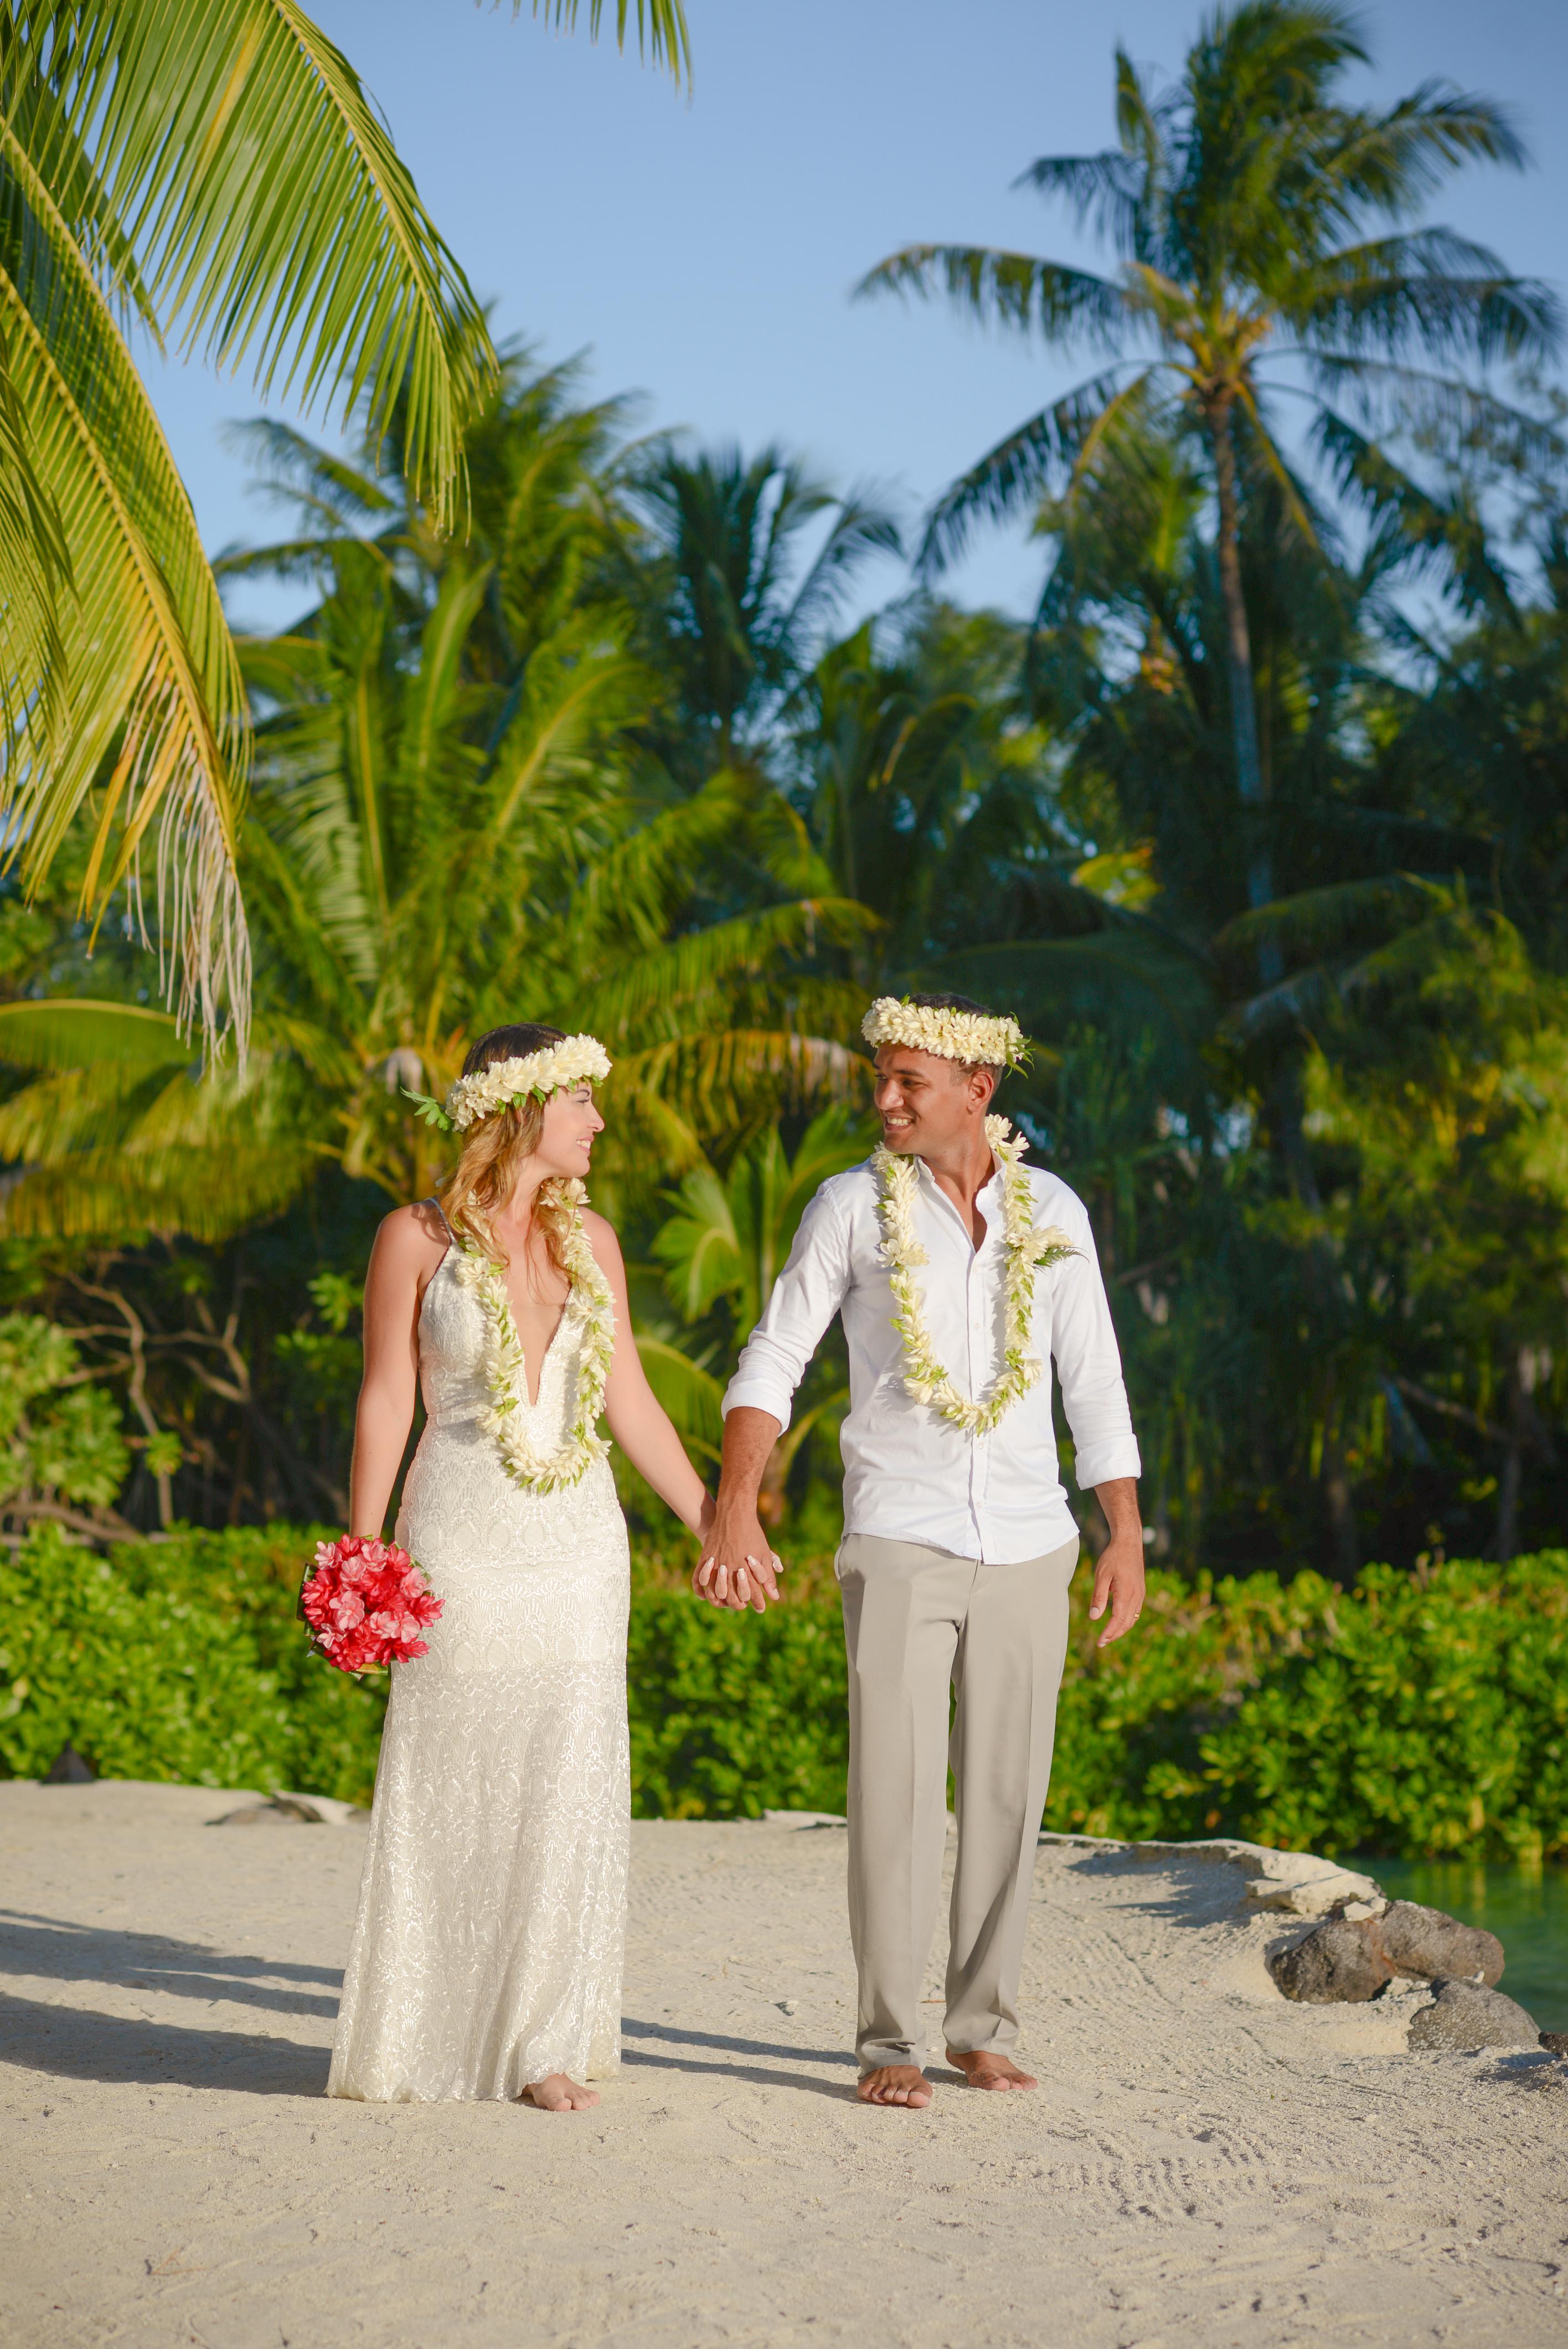 Lua de Mel Bora Bora - Cerimônia de Casamento Tradicional na Praia Intercontinental Bora Bora Thalasso - Pé na areia Bora Bora